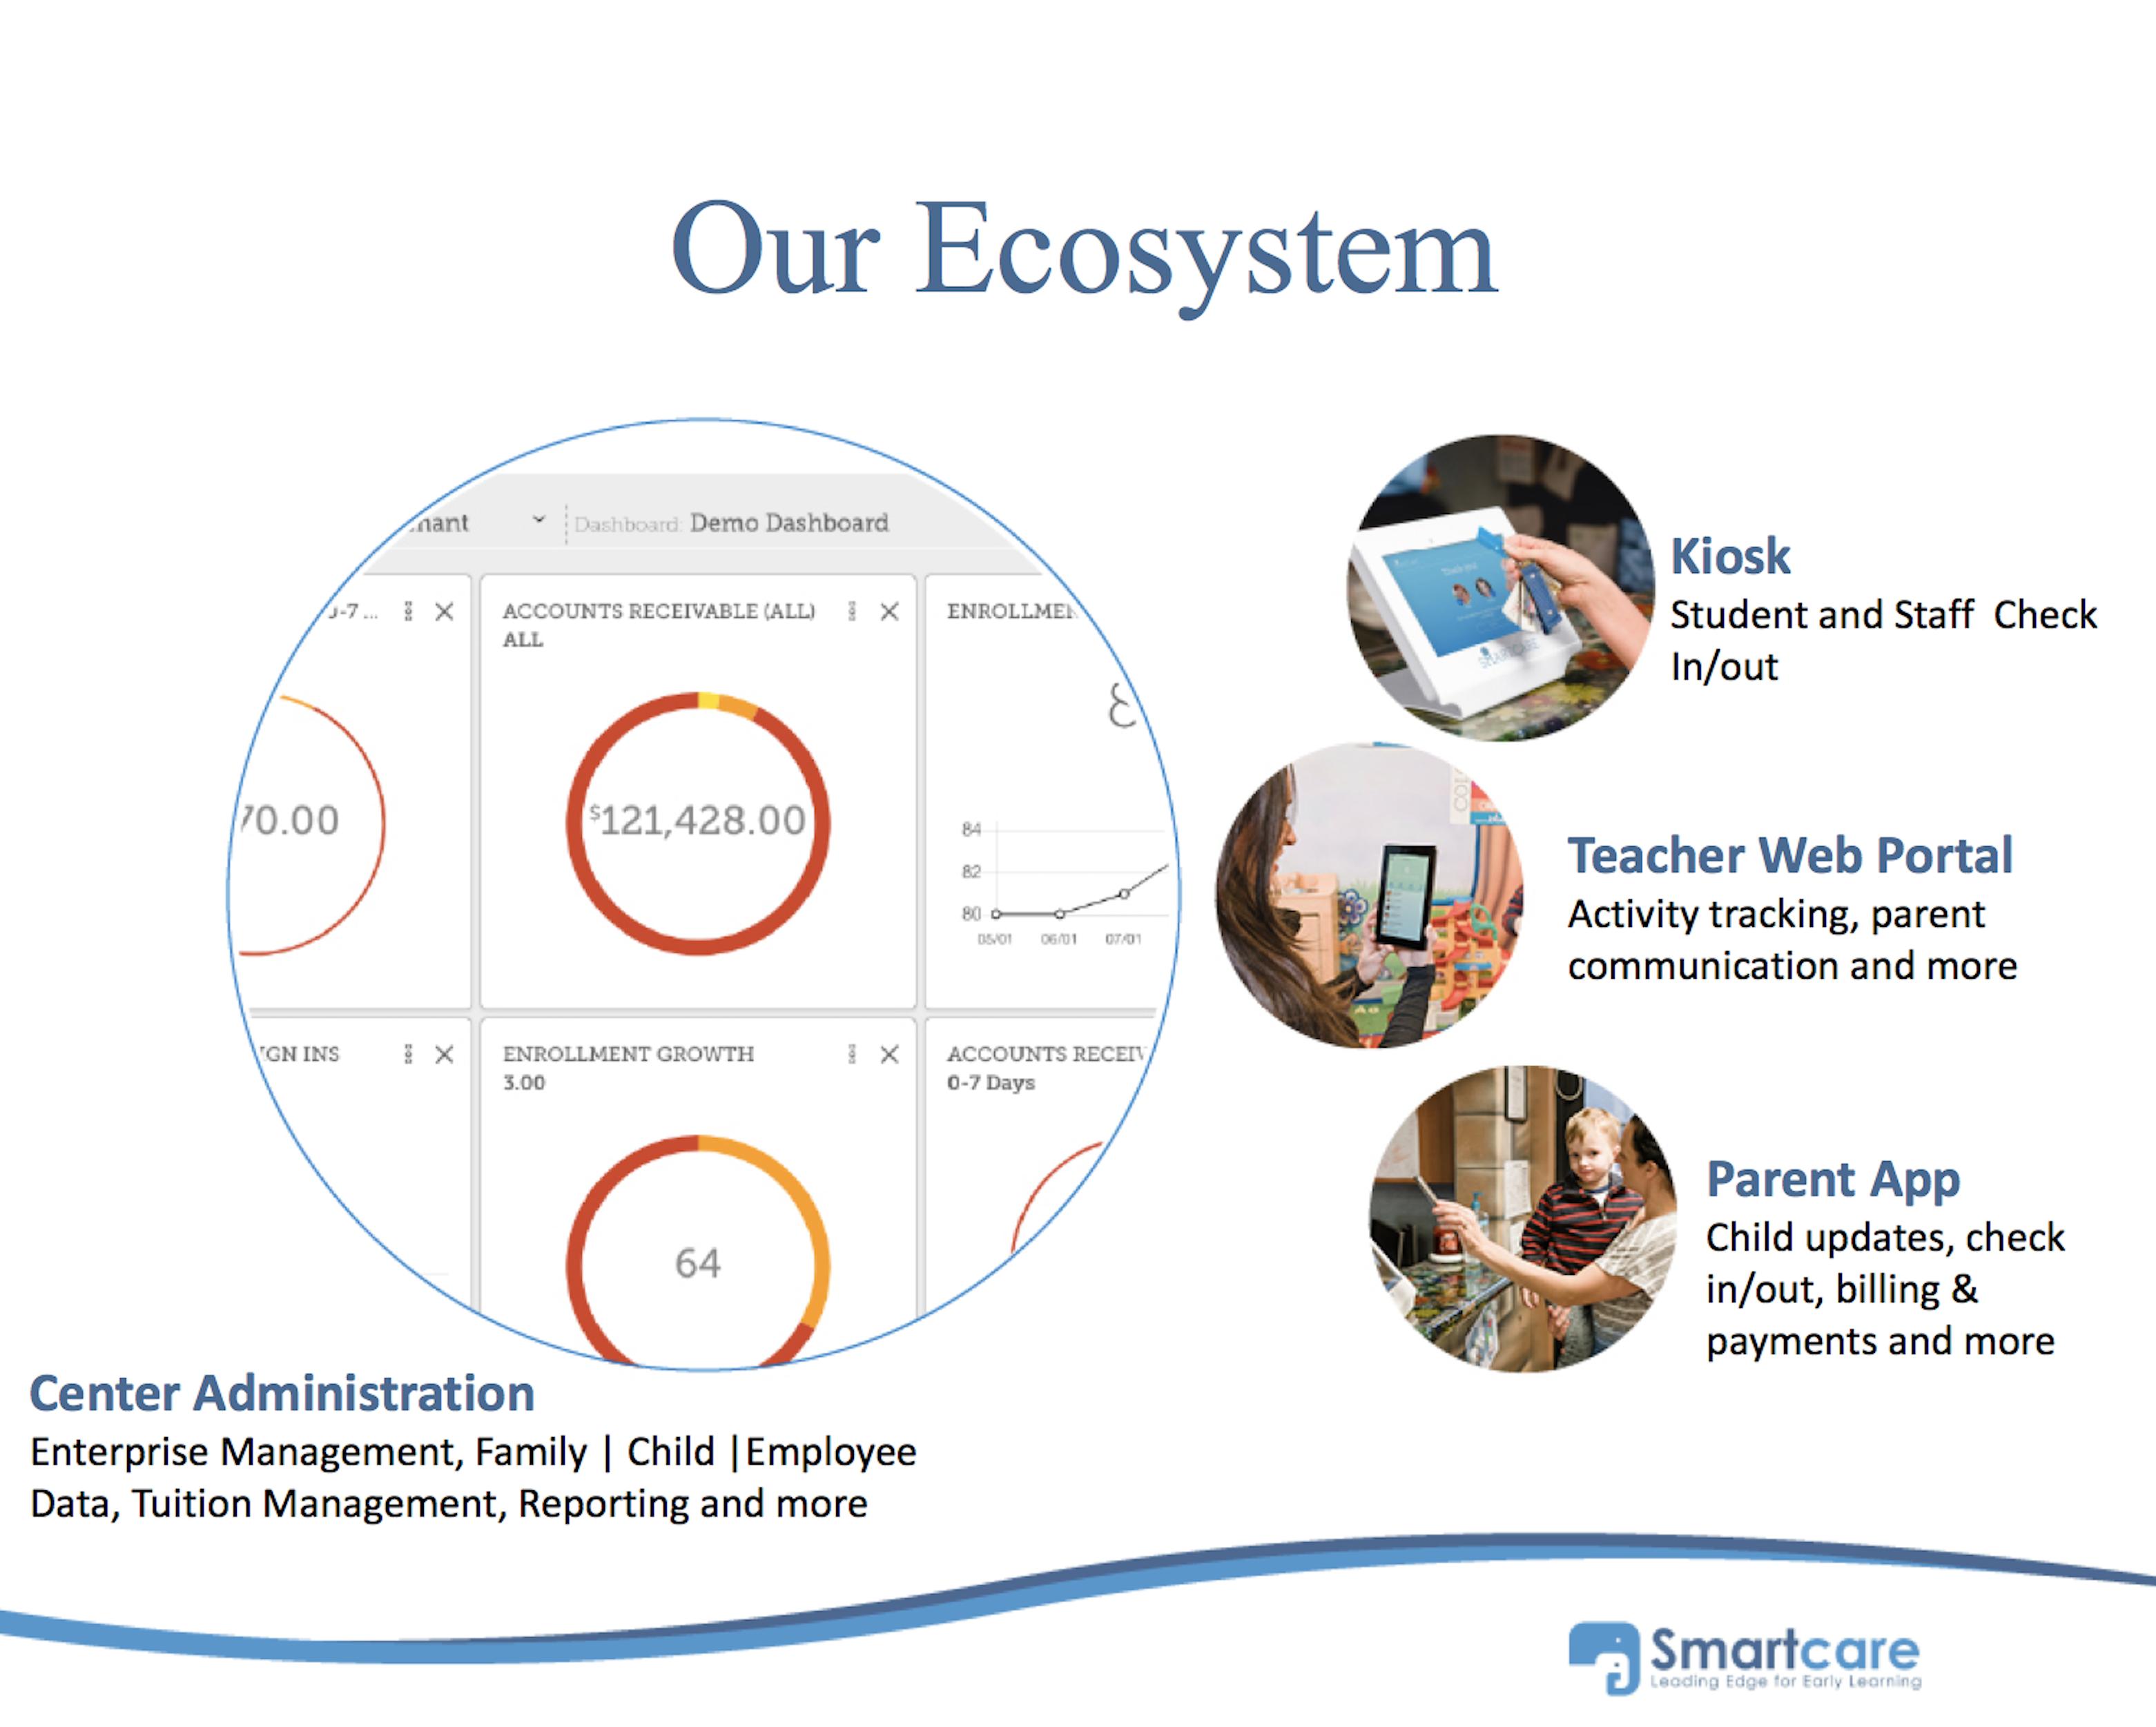 Smartcare Demo - Our Ecosystem